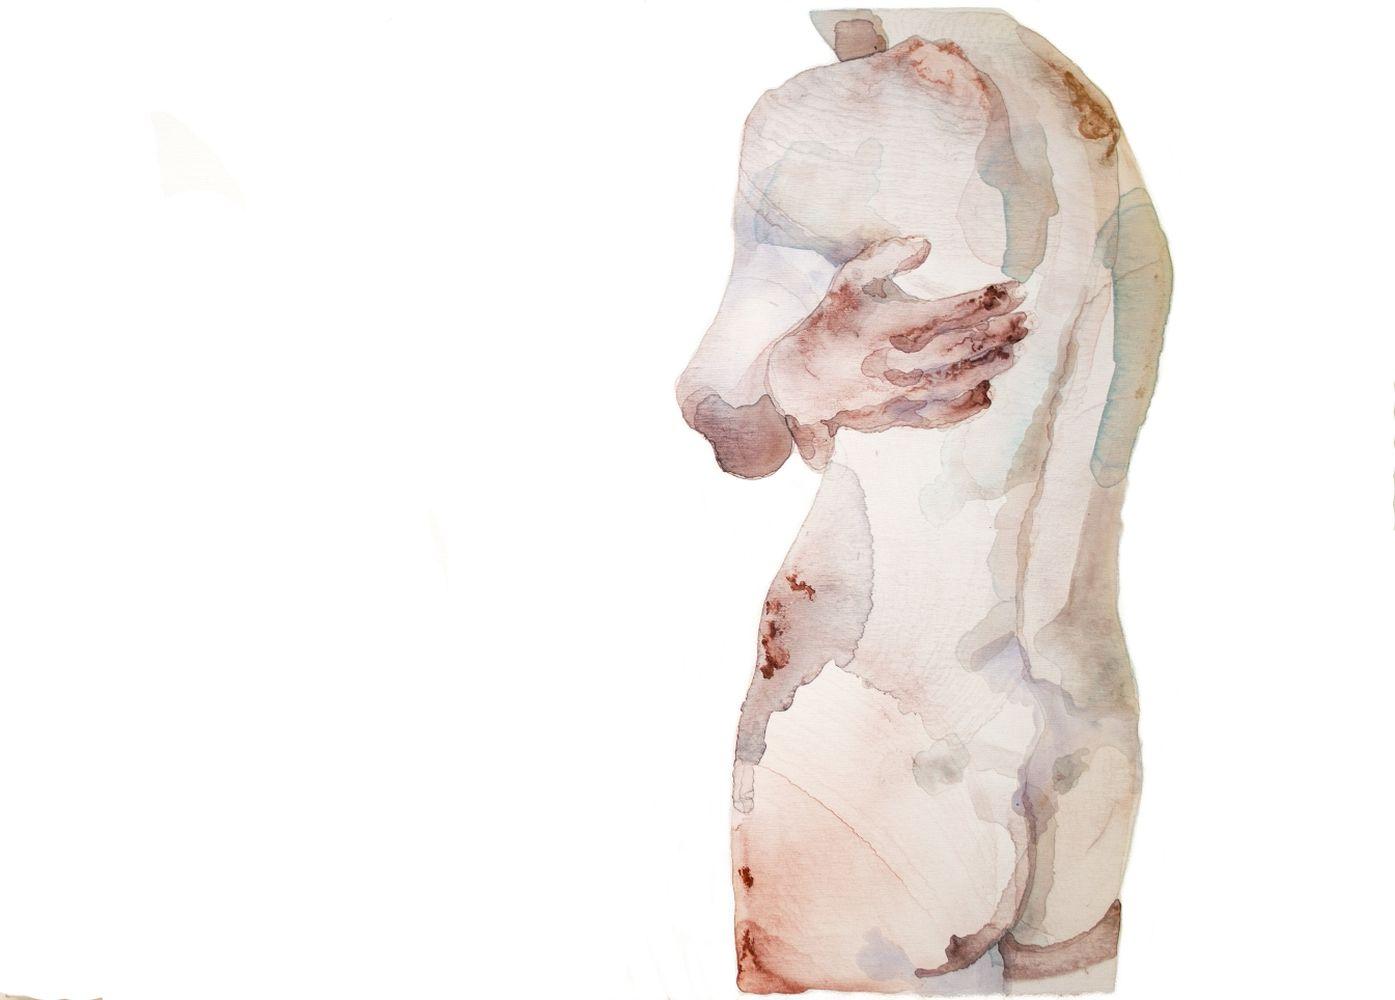 Nemes Anna: Mammográfia